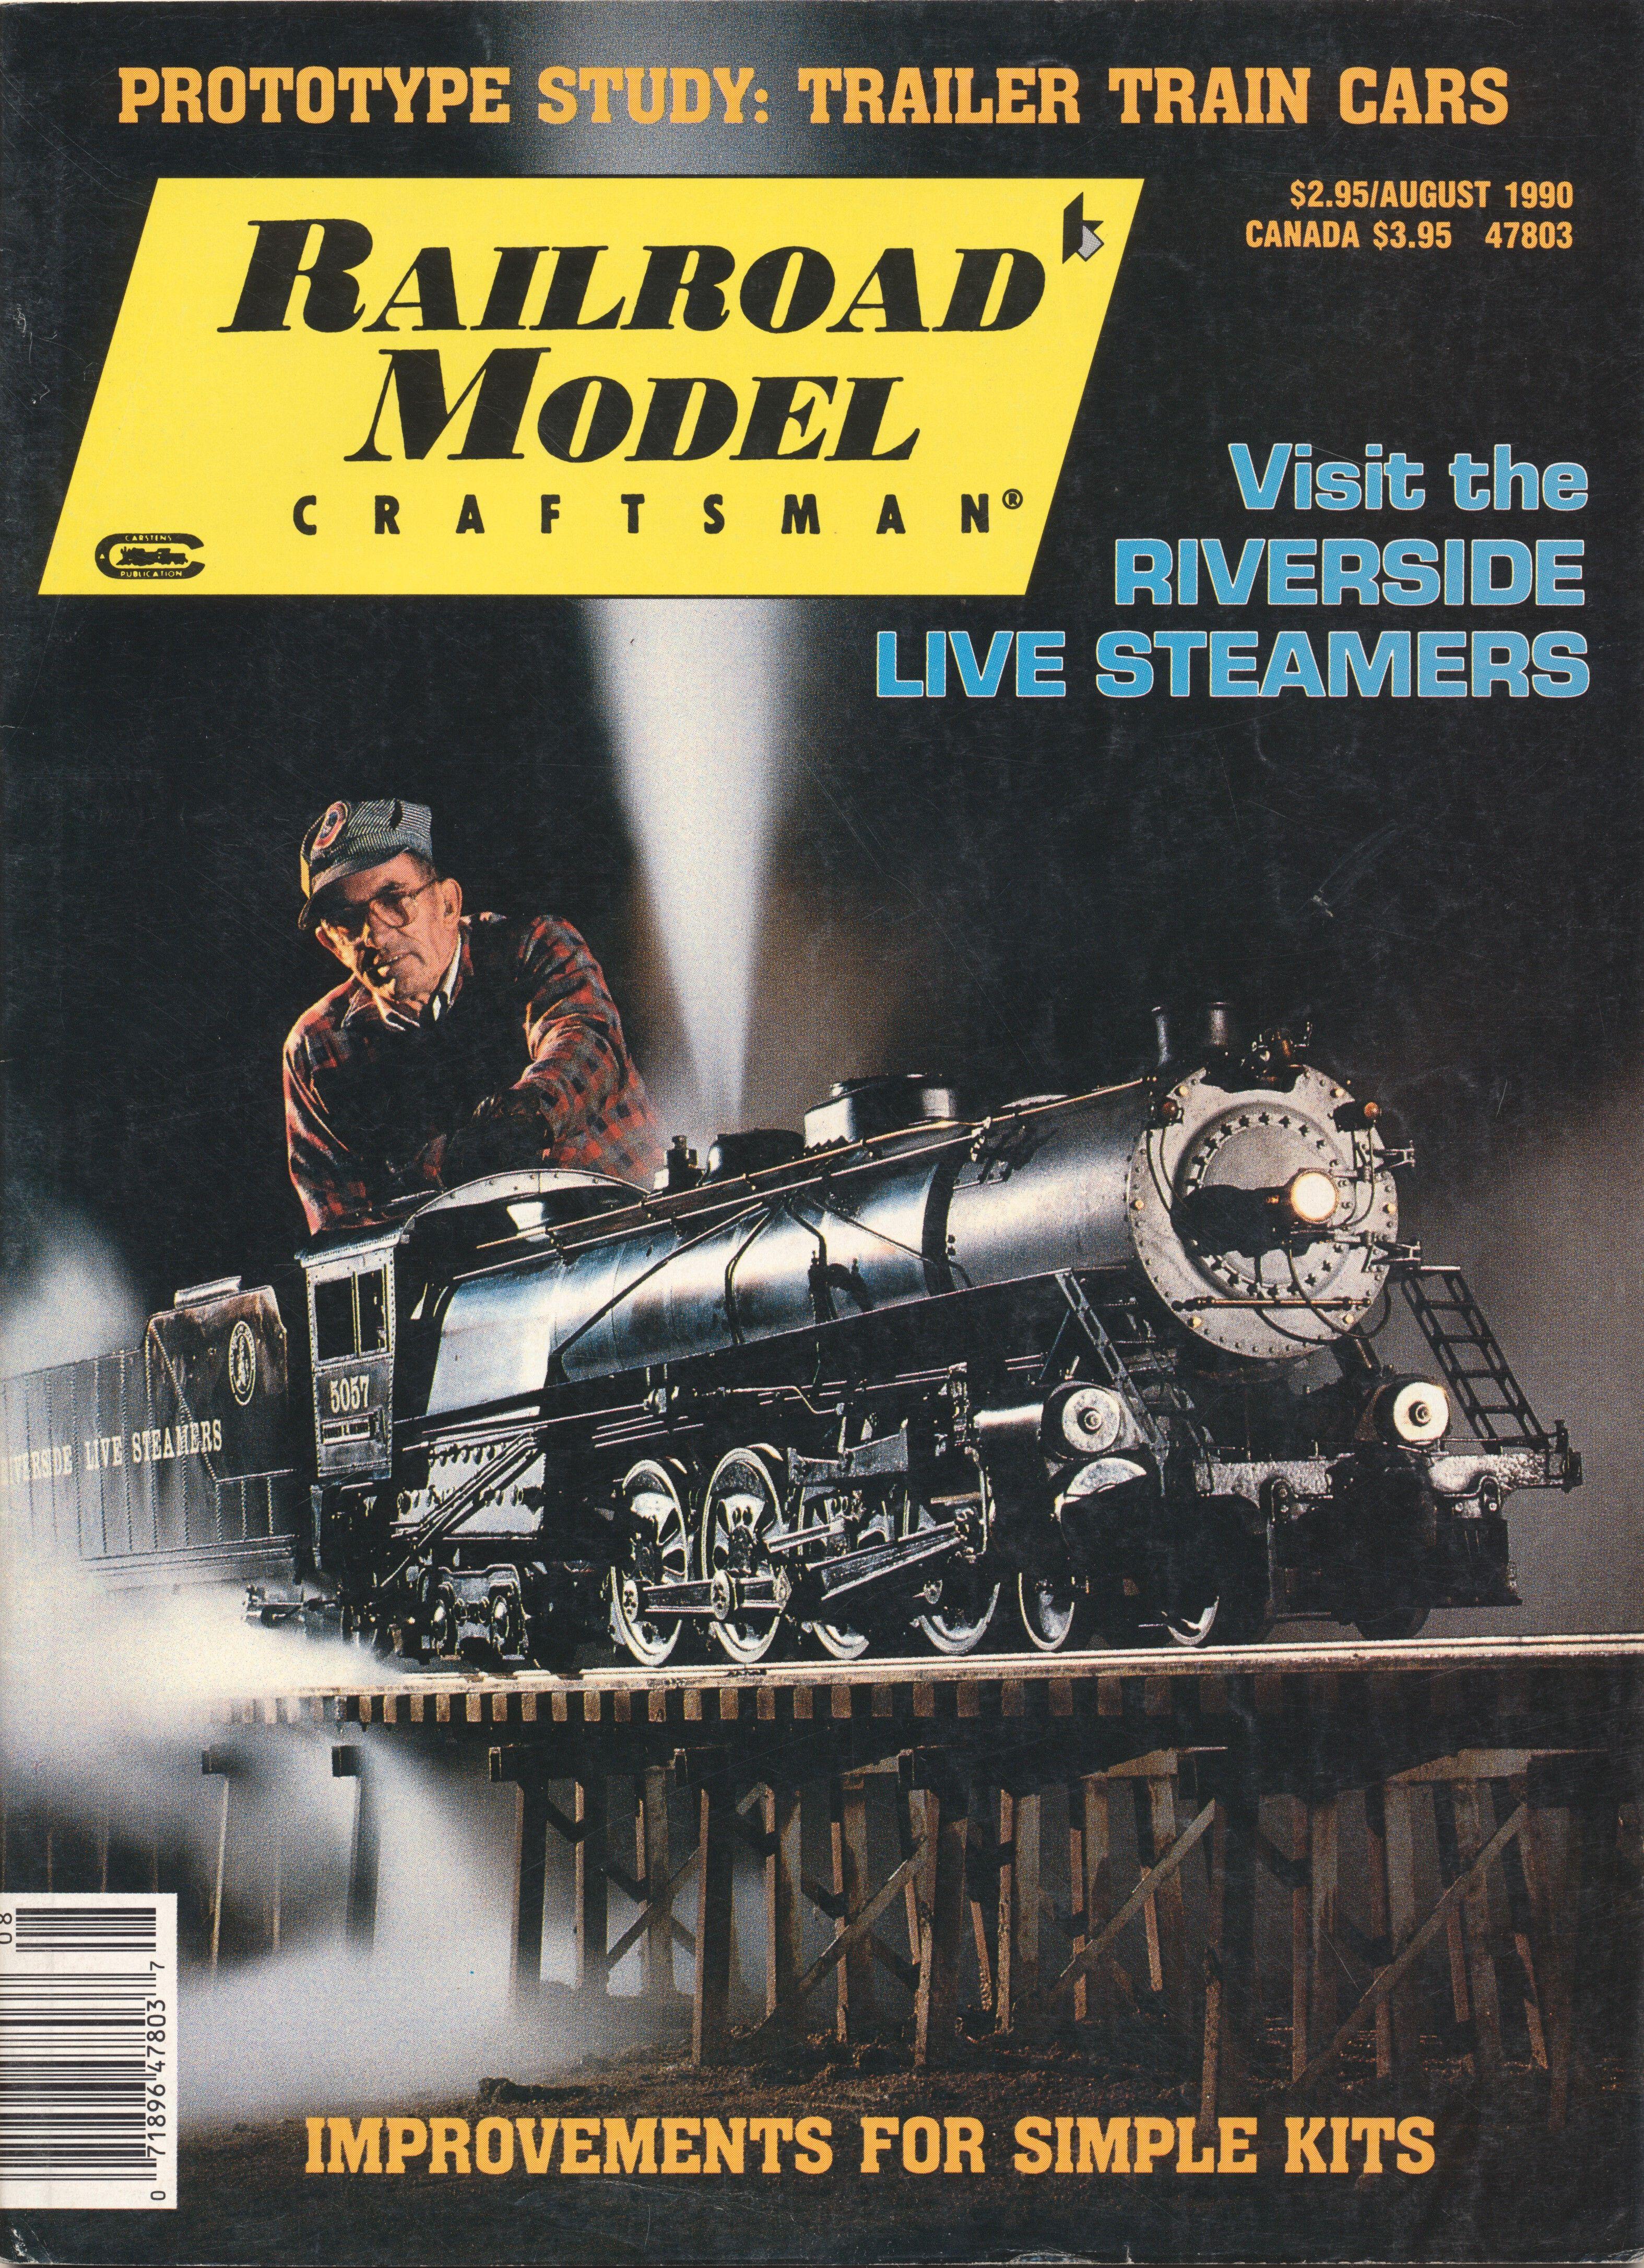 Railroad Model Craftsman, August 1990